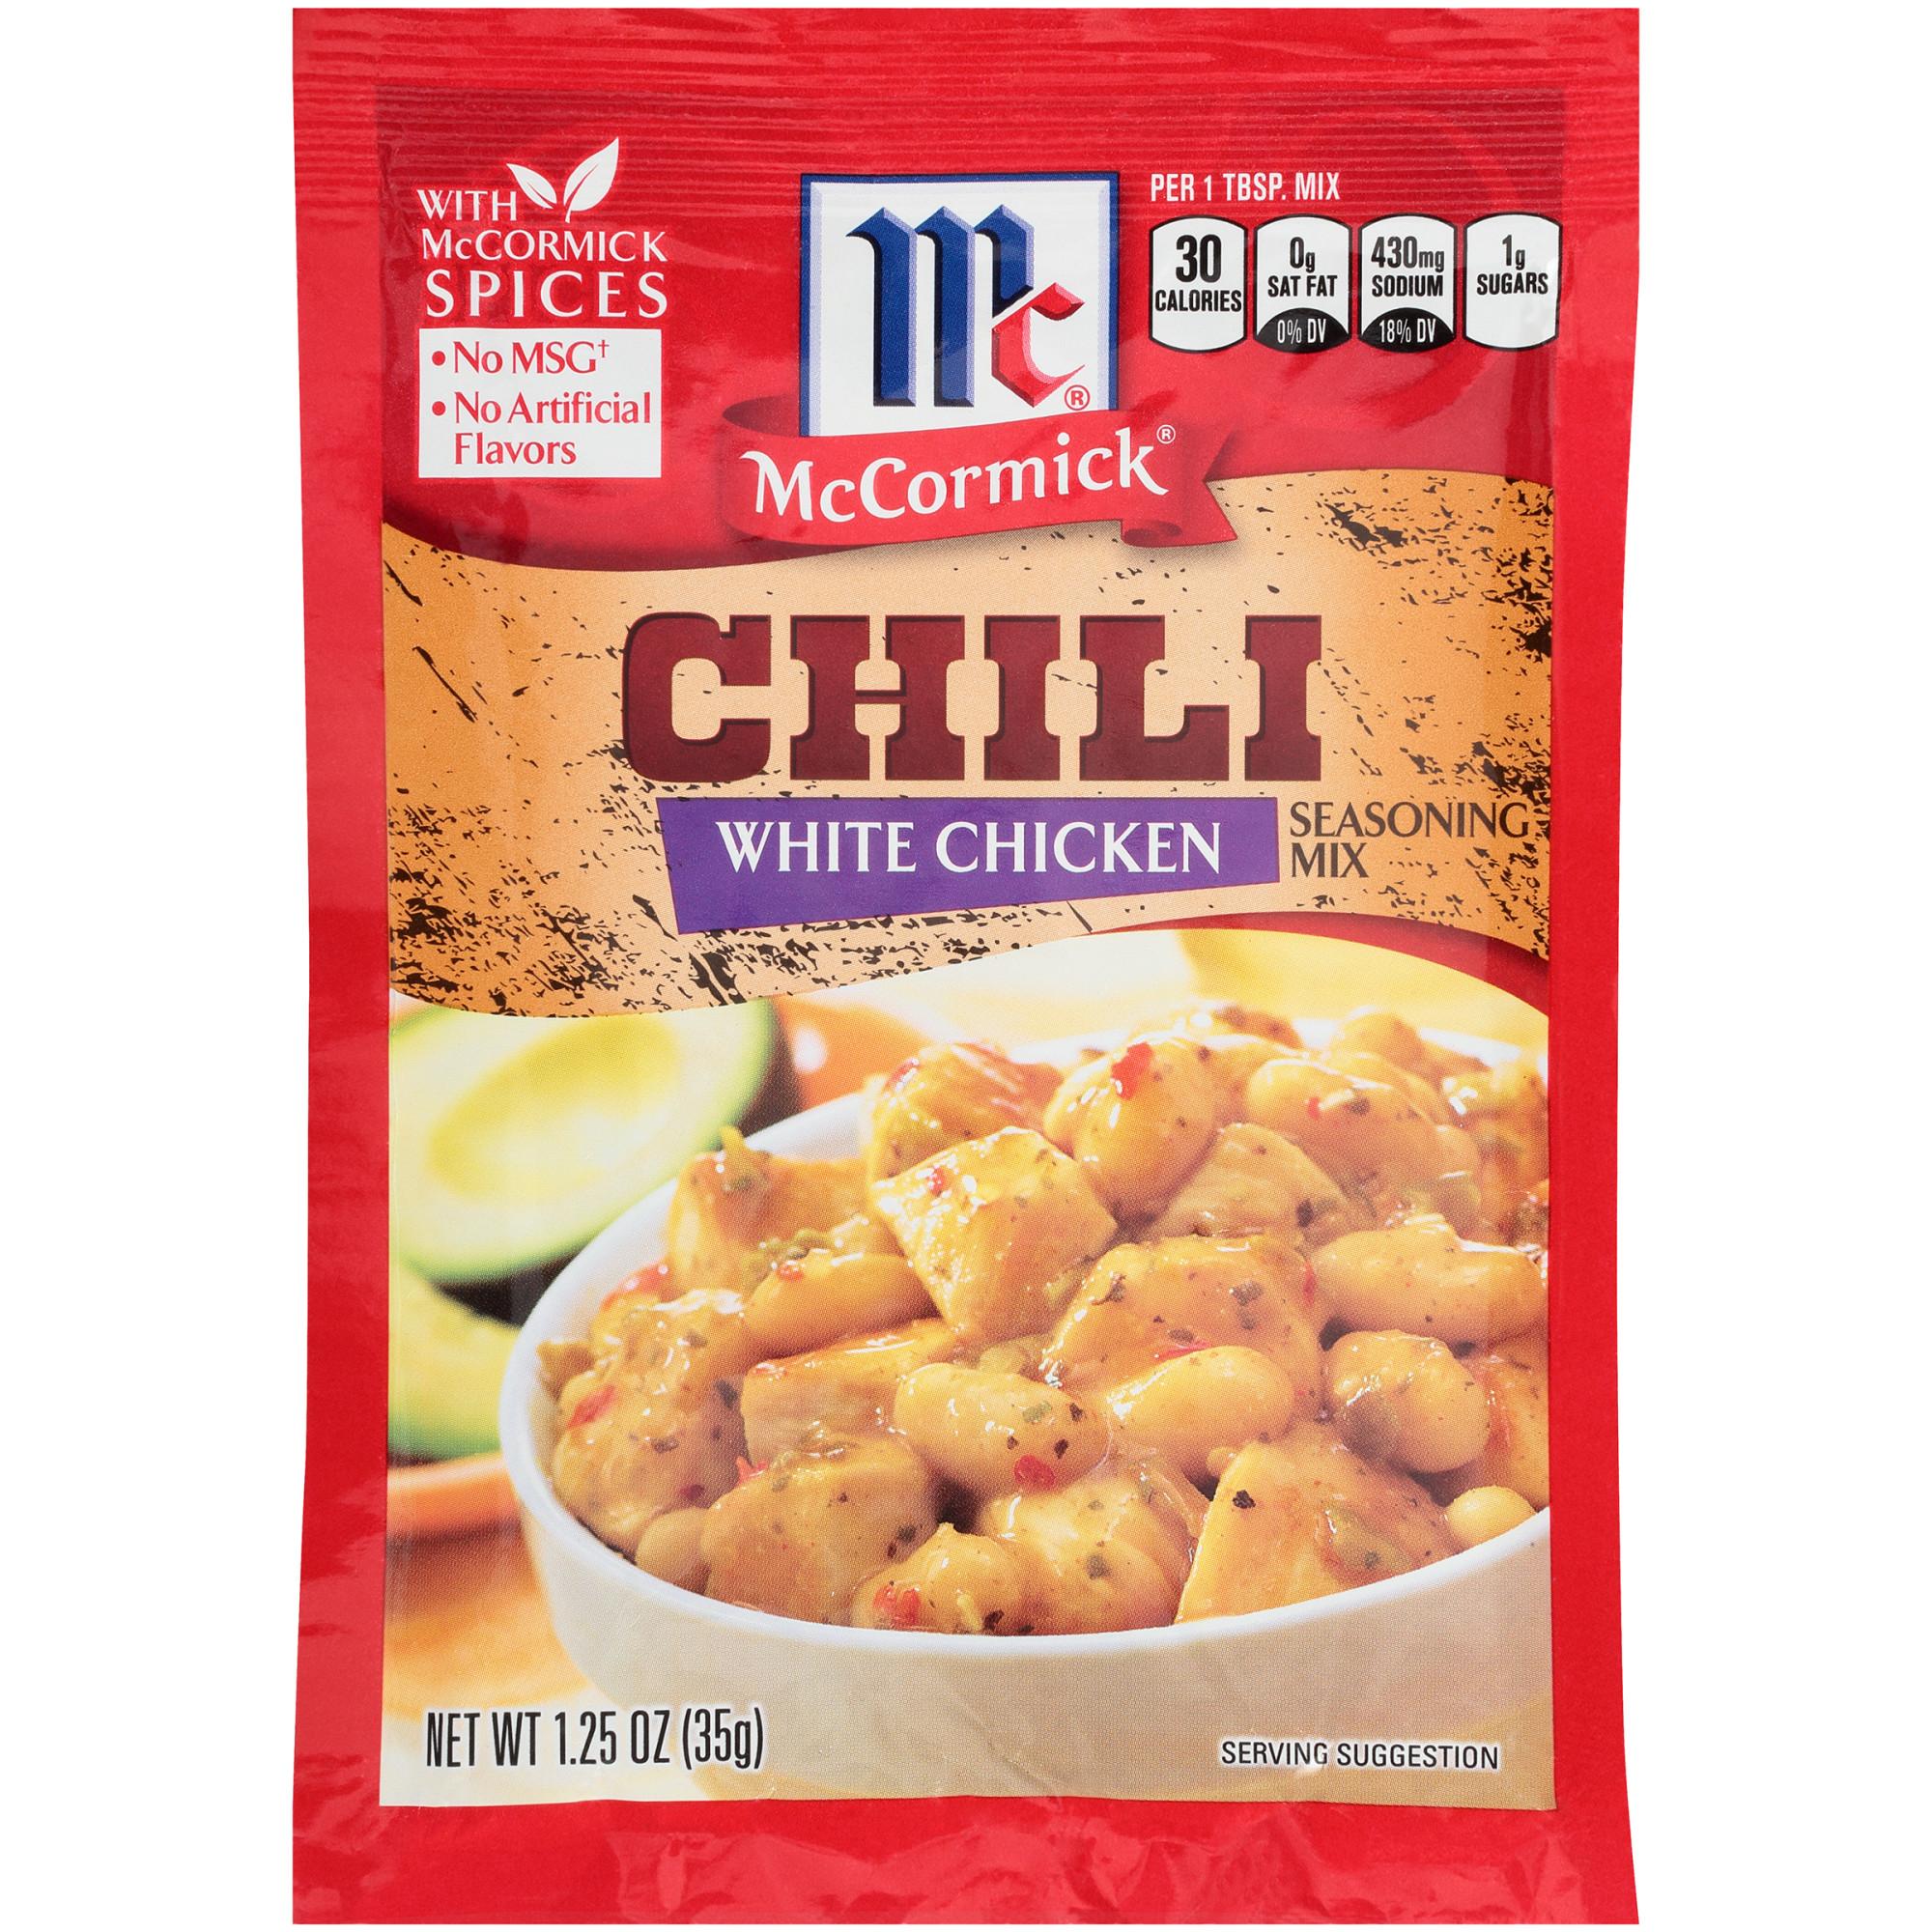 (4 Pack) McCormick White Chicken Chili Seasoning Mix, 1.25 oz